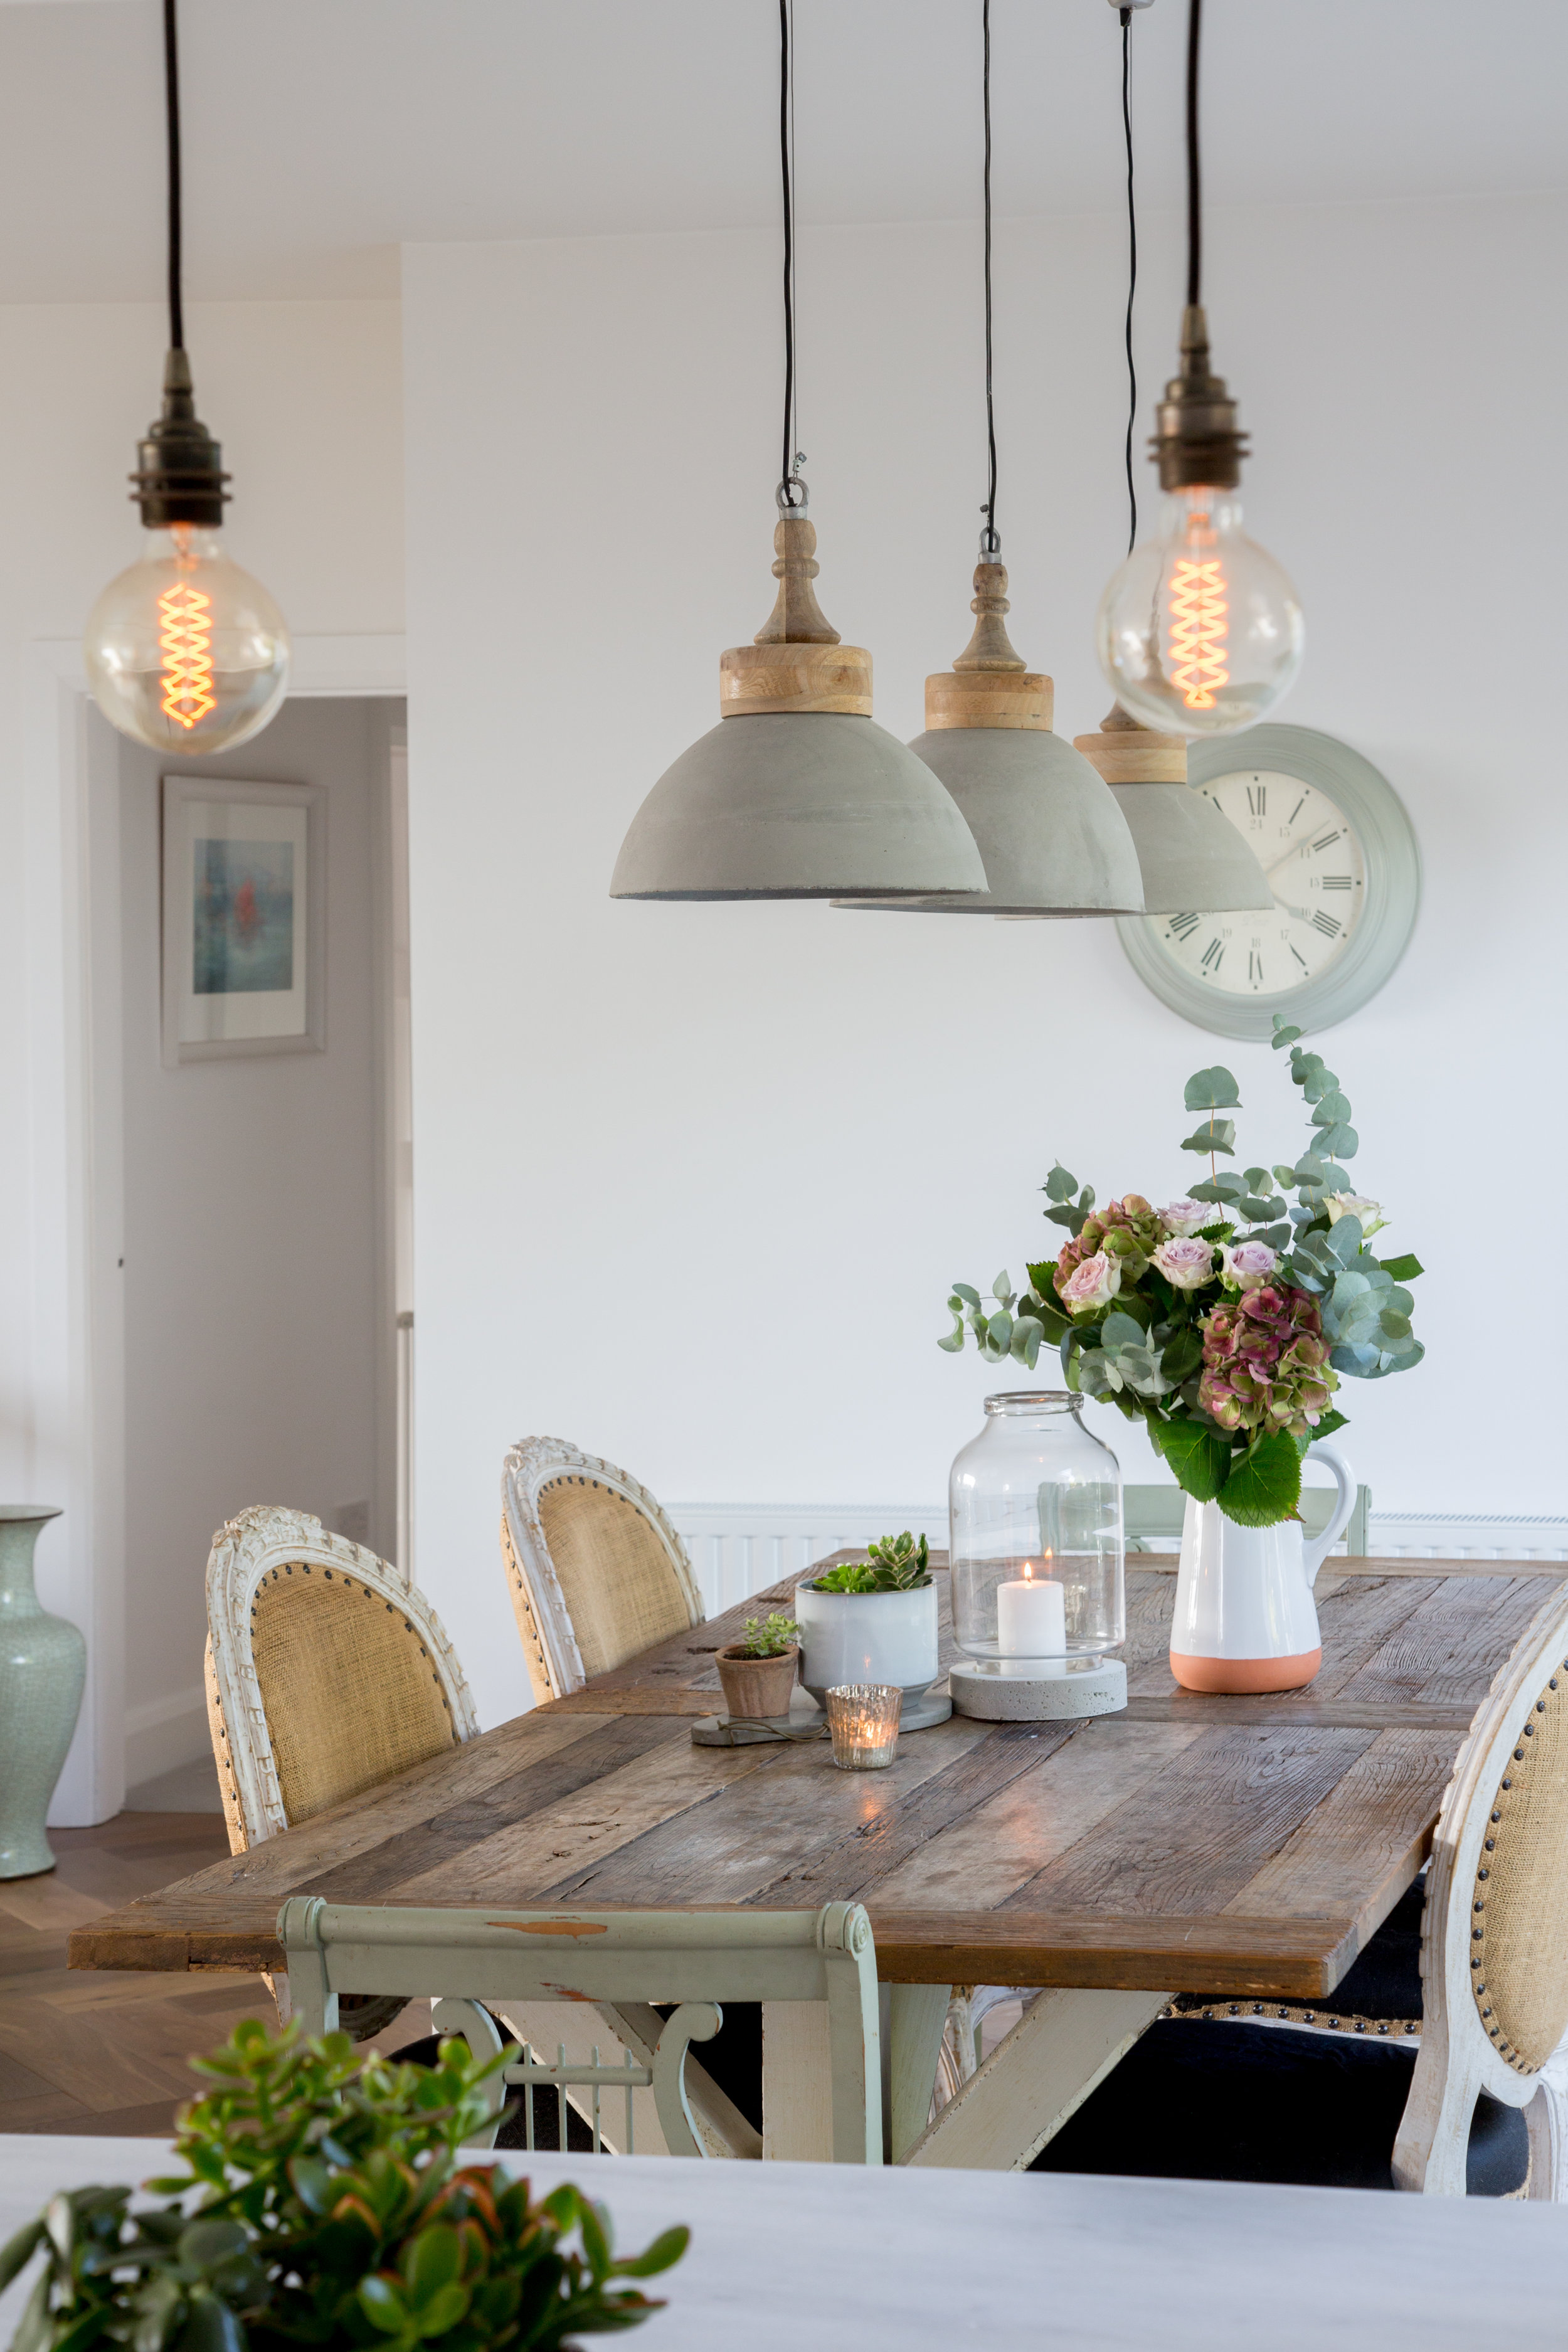 Lamb_Design_Paper_and_Moon_Emma_Lynch_Louise_Dockery_Scandi_French_Danish_homeware_Irish_business_interior_designer_dining_room_burlap_chairs.jpg